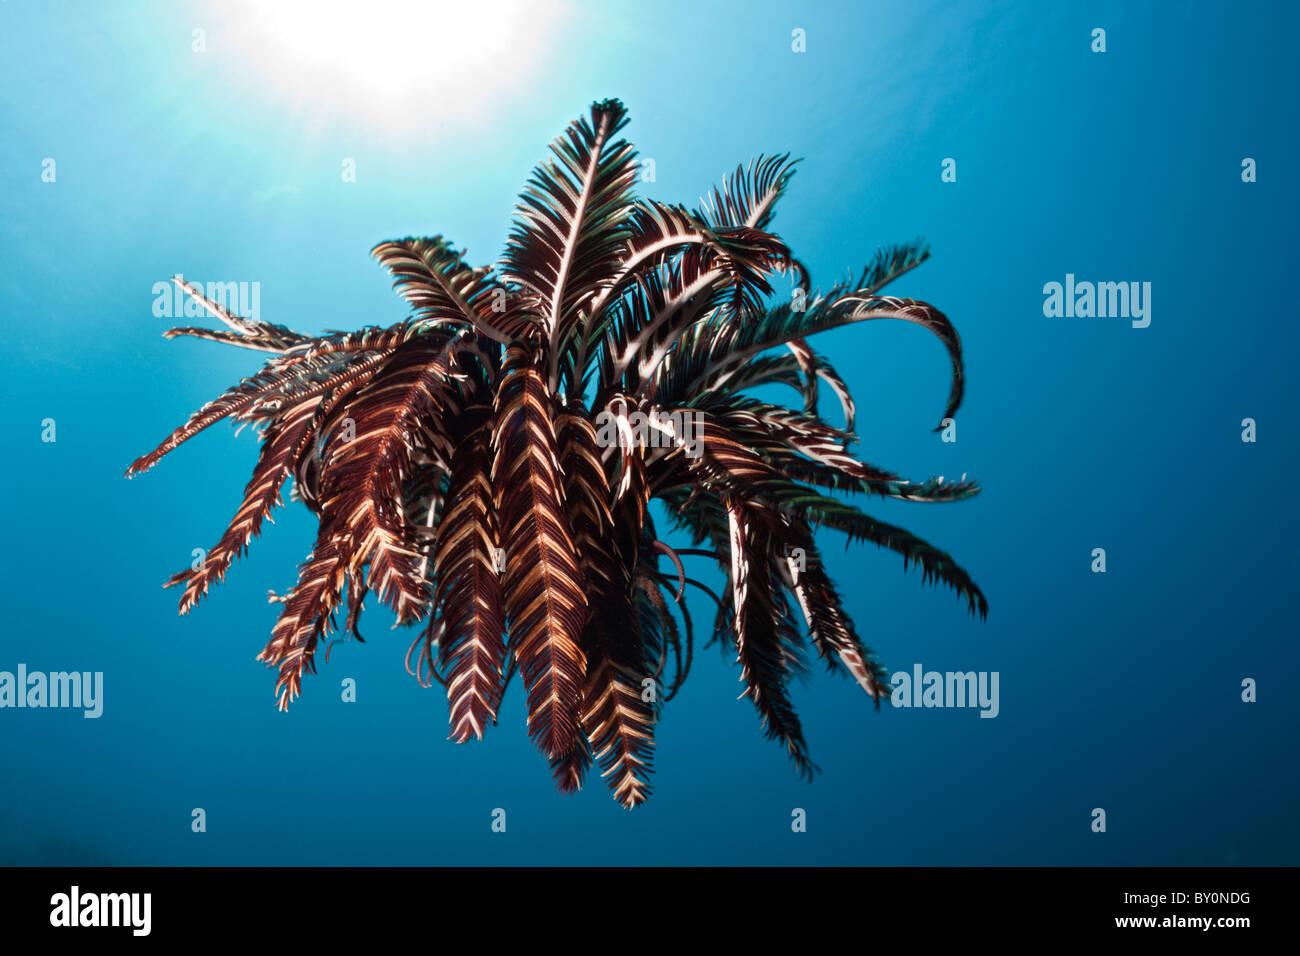 Crinoid hover over Reef, Comantheria sp., Alam Batu, Bali, Indonesia - Stock Image